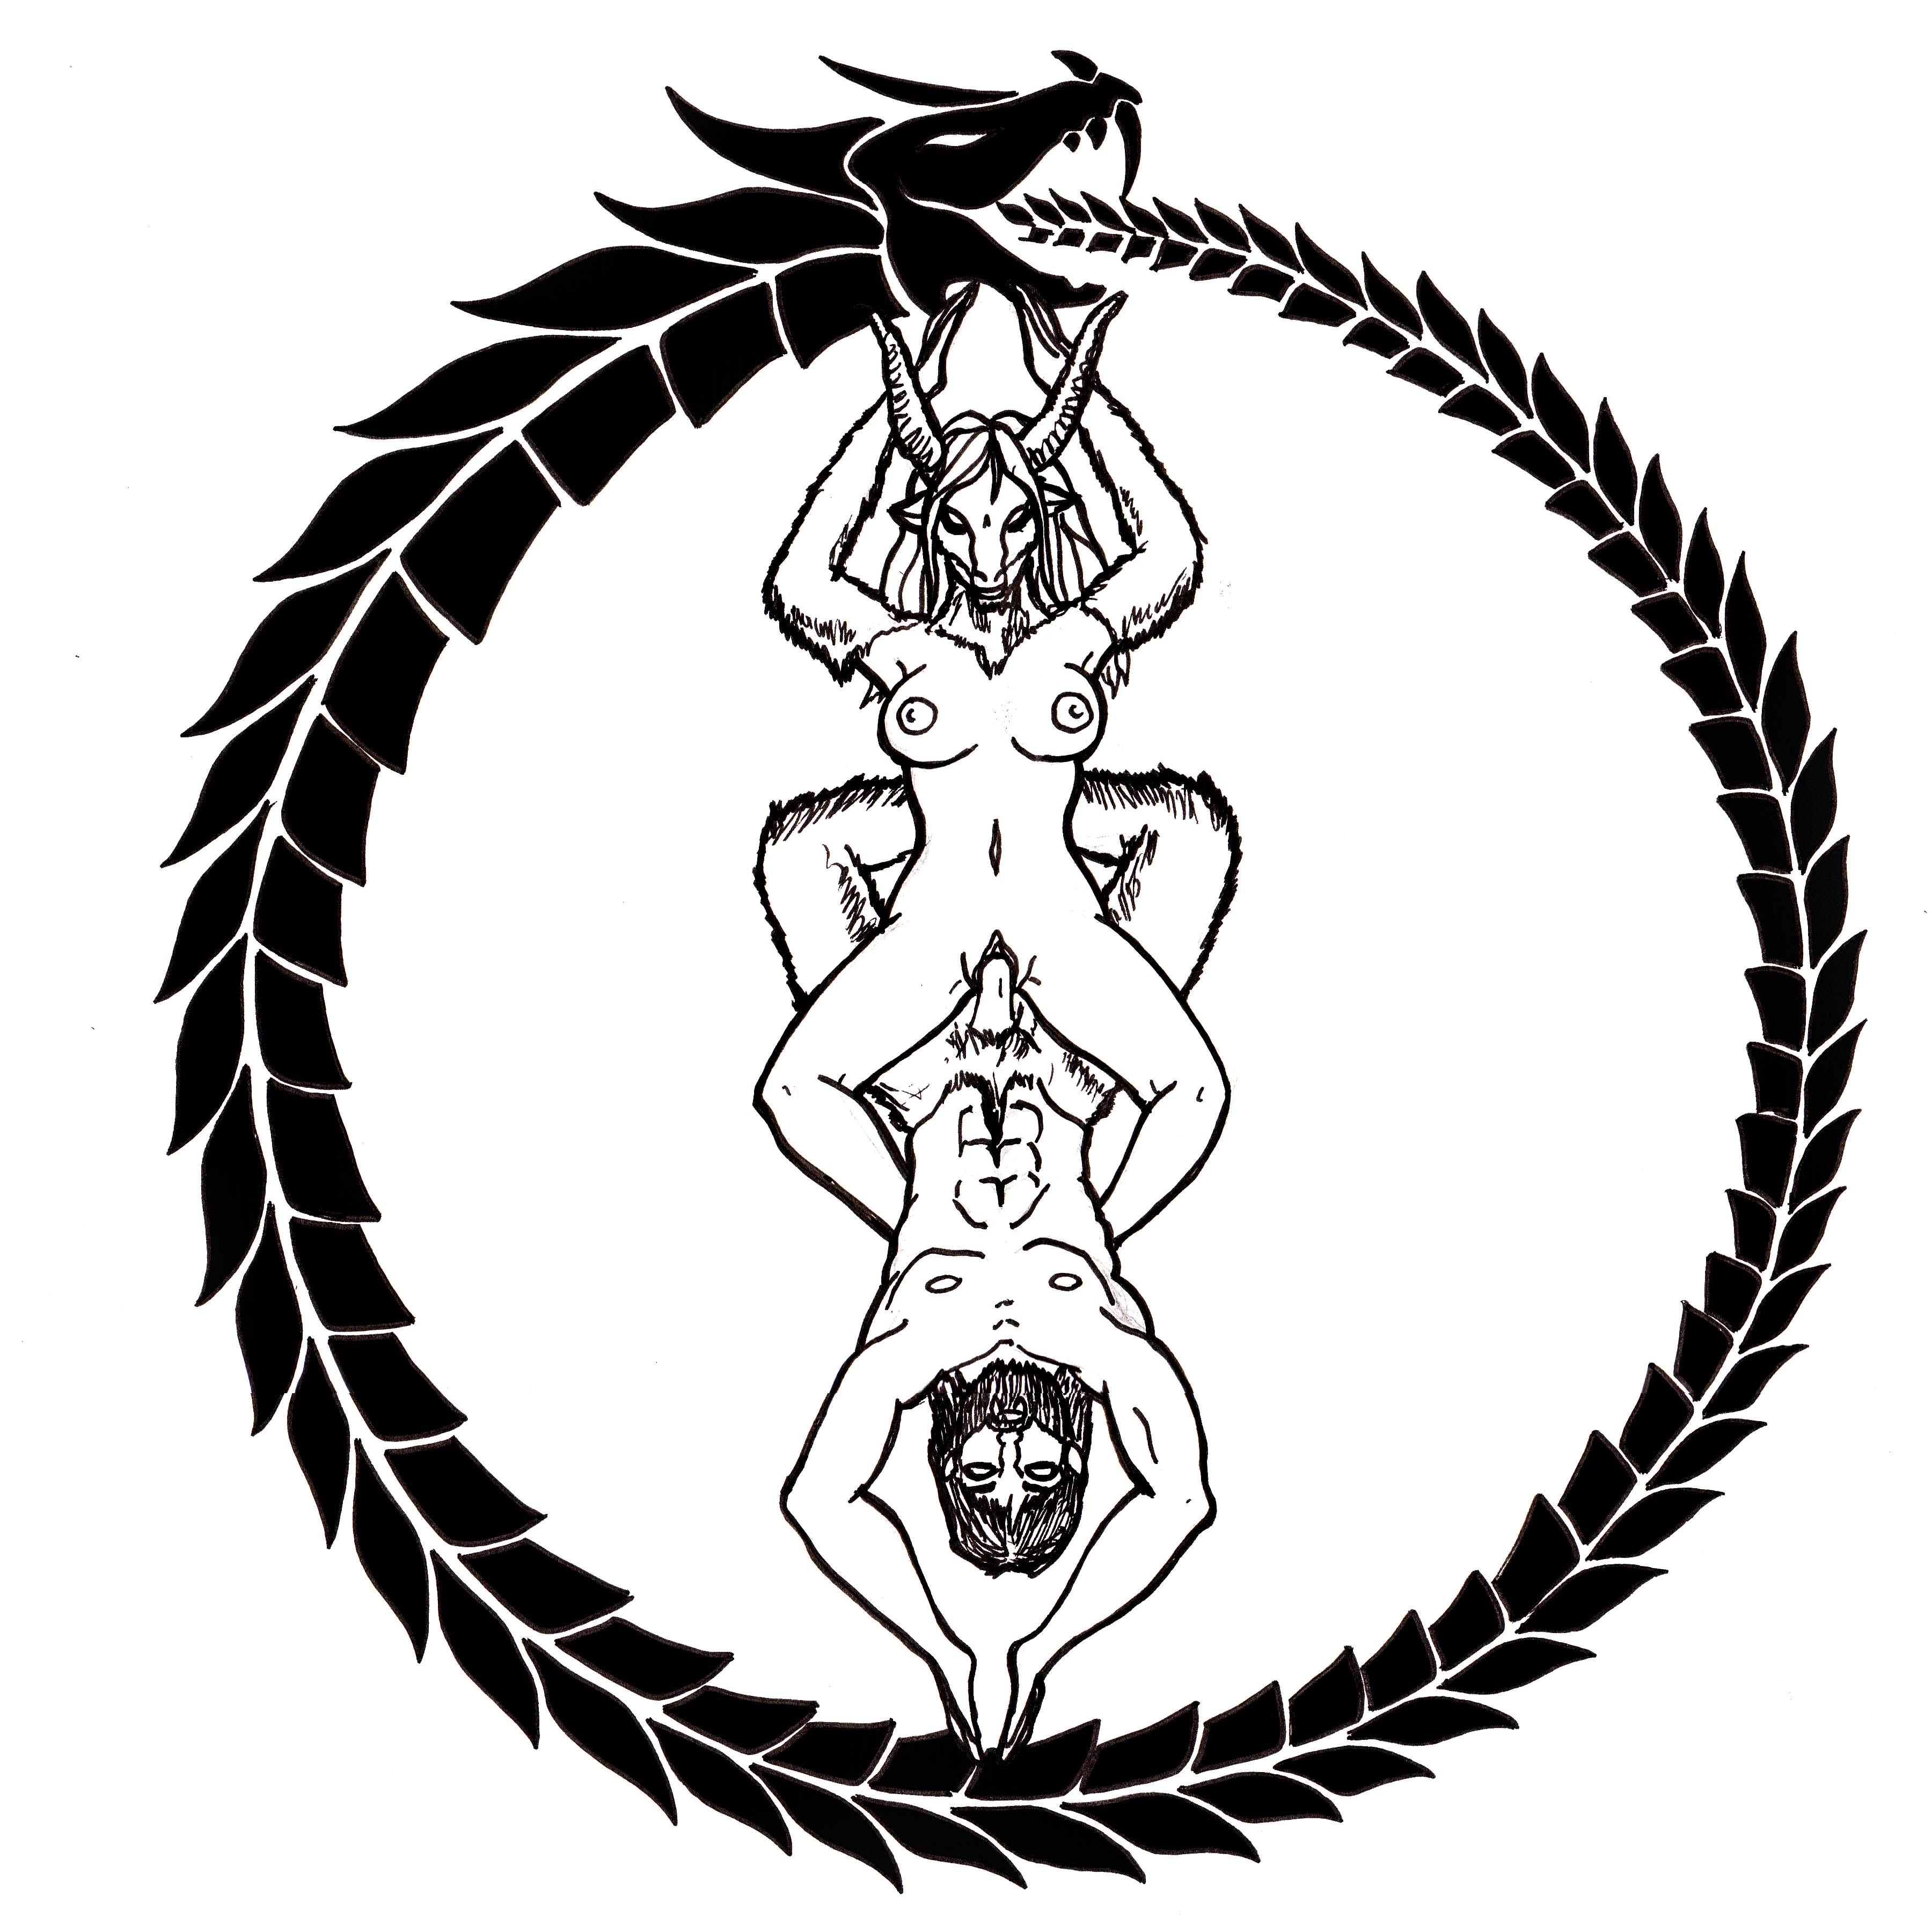 Drawn sykol demonic Google Satanic Symbols Pinterest Search